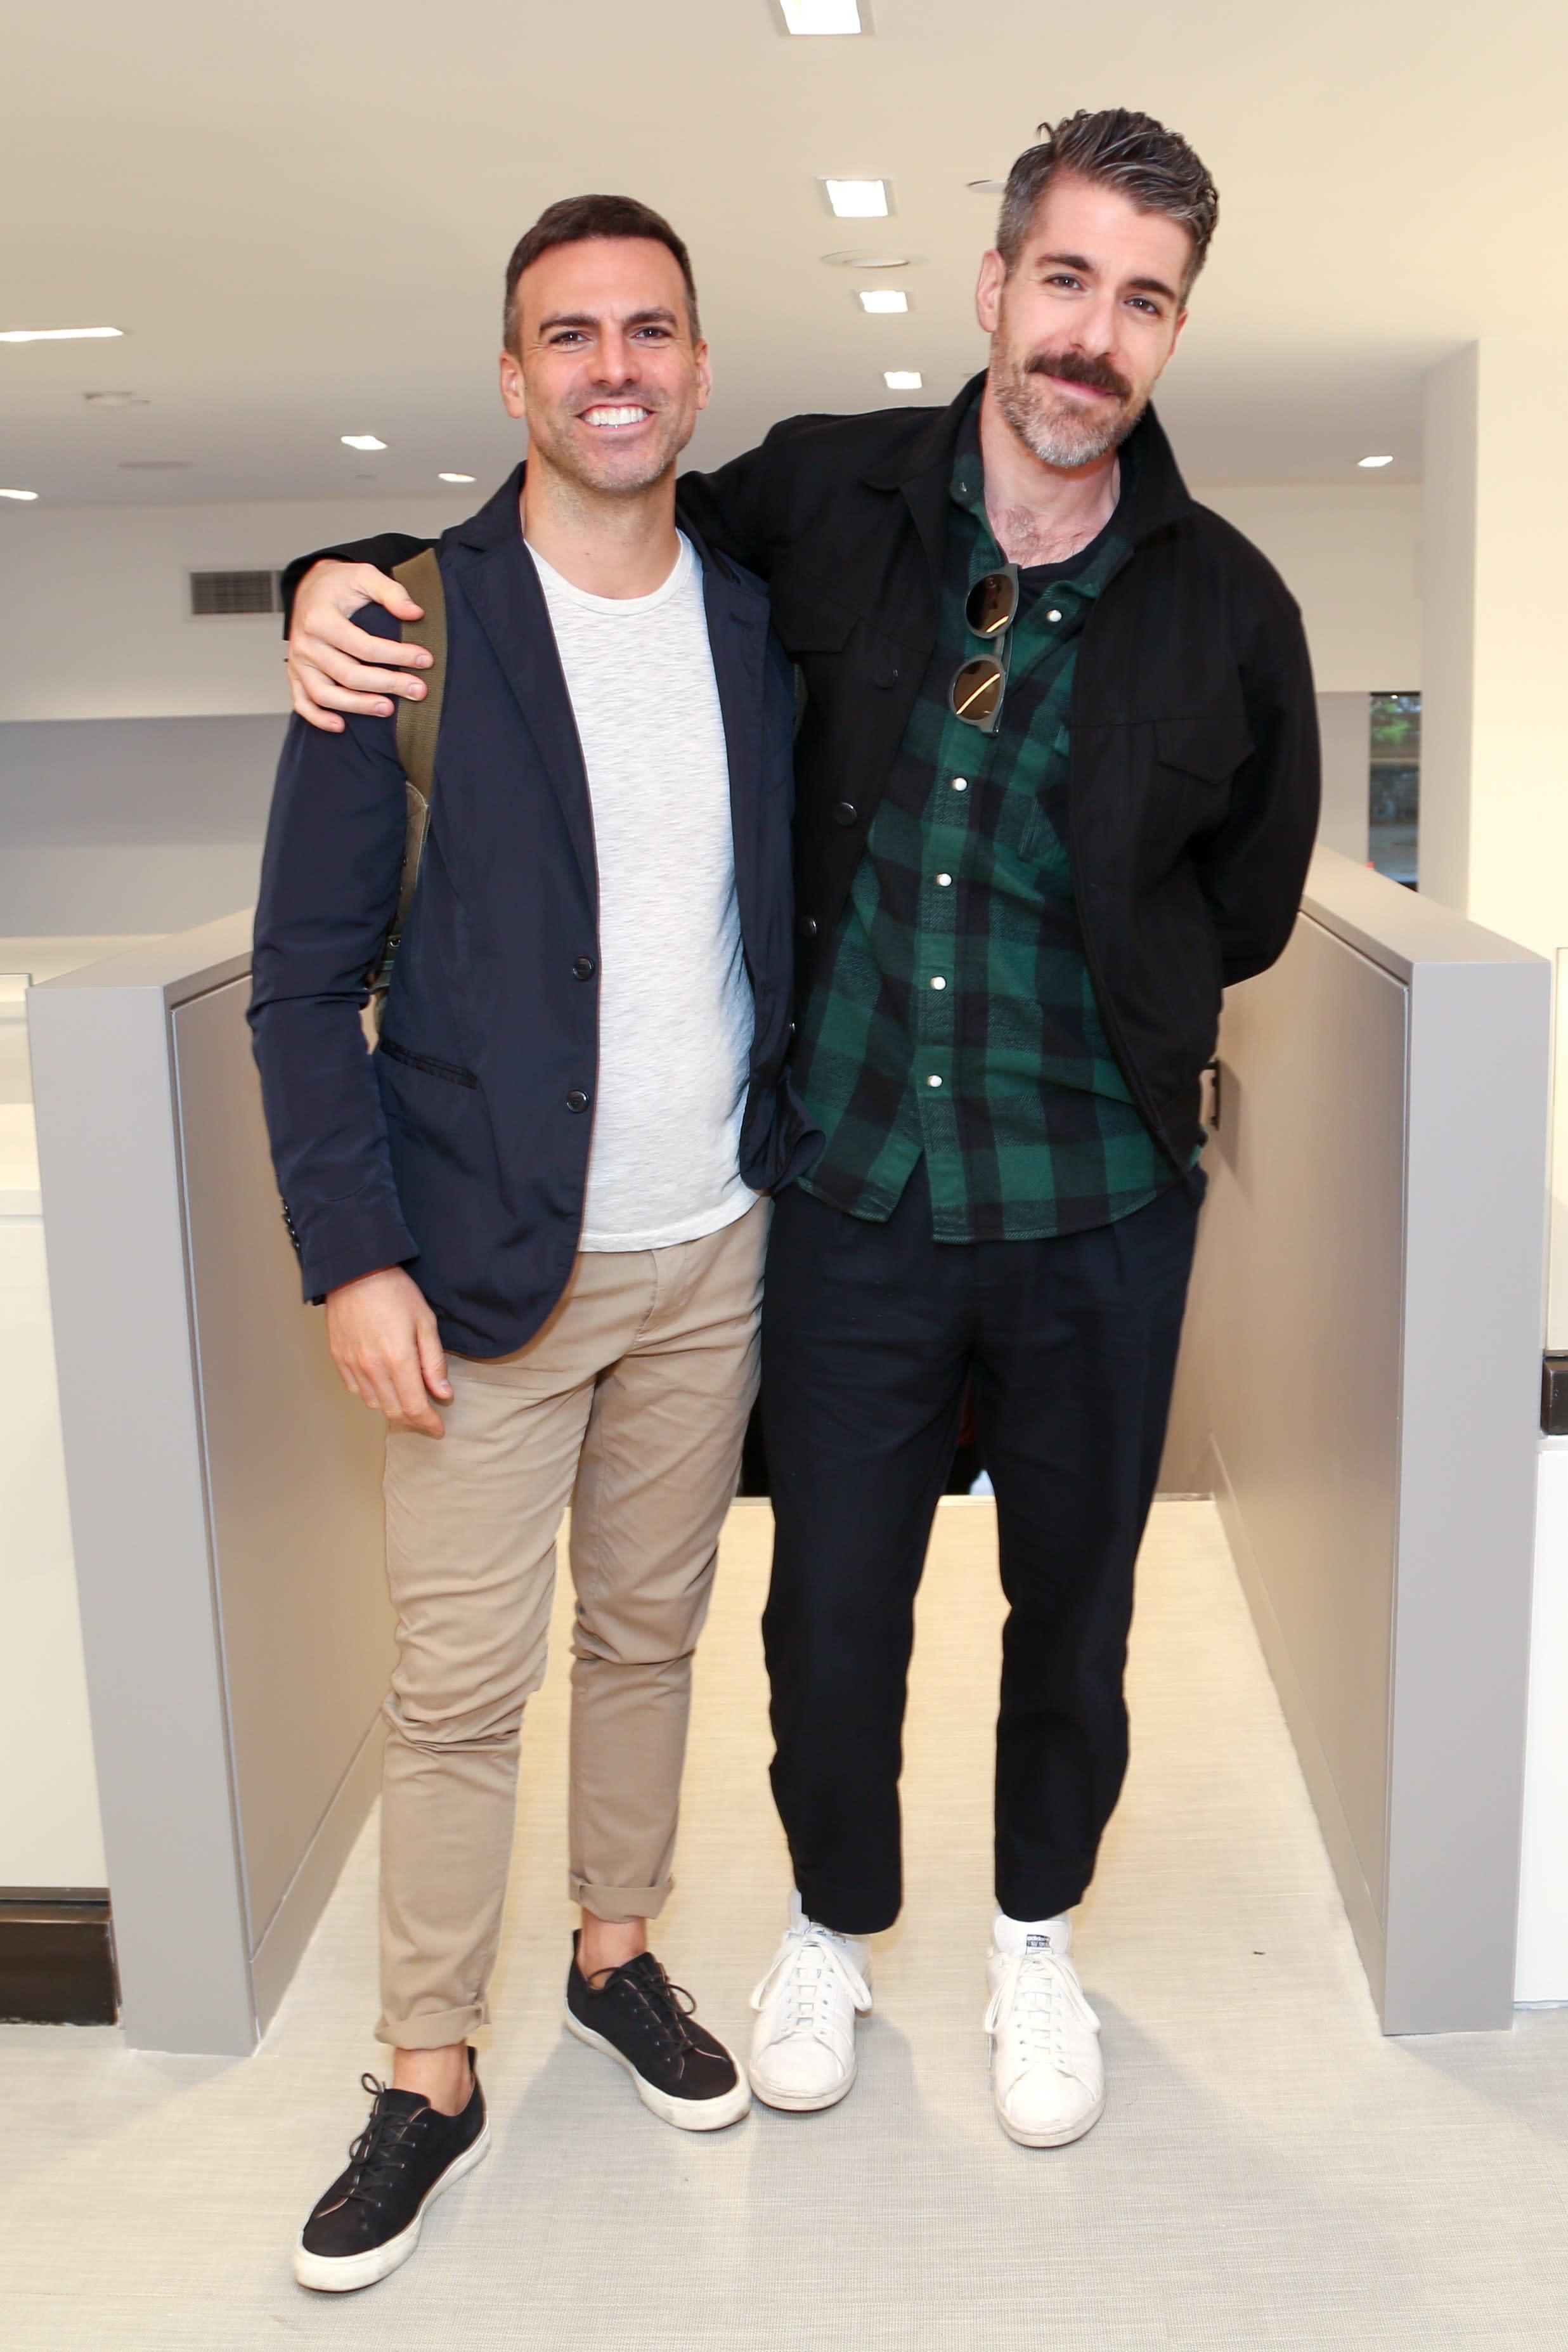 Designer Neal Beckstedt and ZAK + FOX Principal Zak Profera